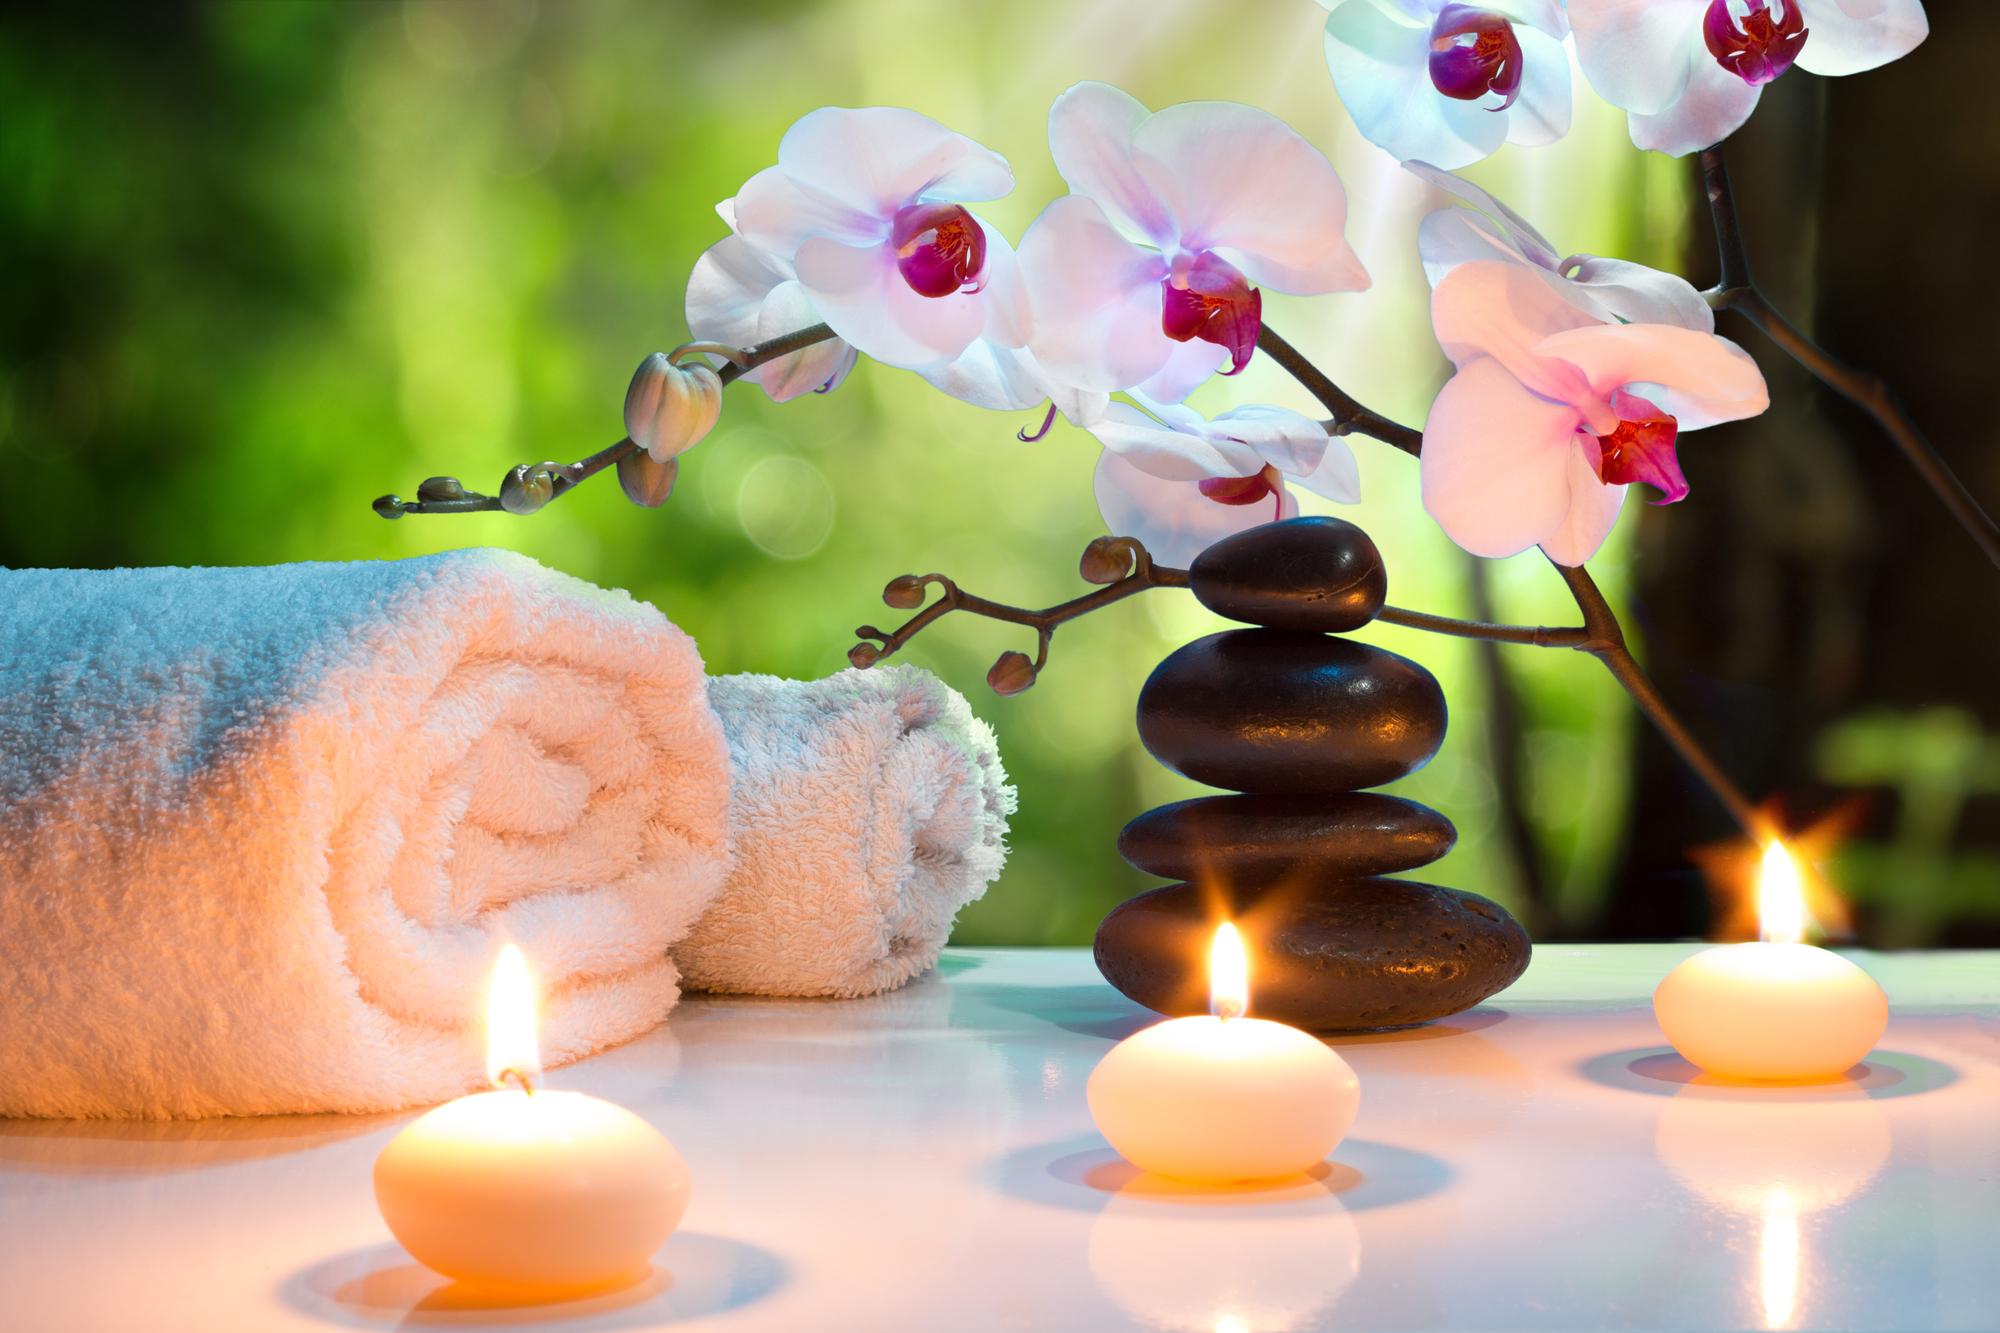 massage therapy bodywork atlanta georgia 3.jpg